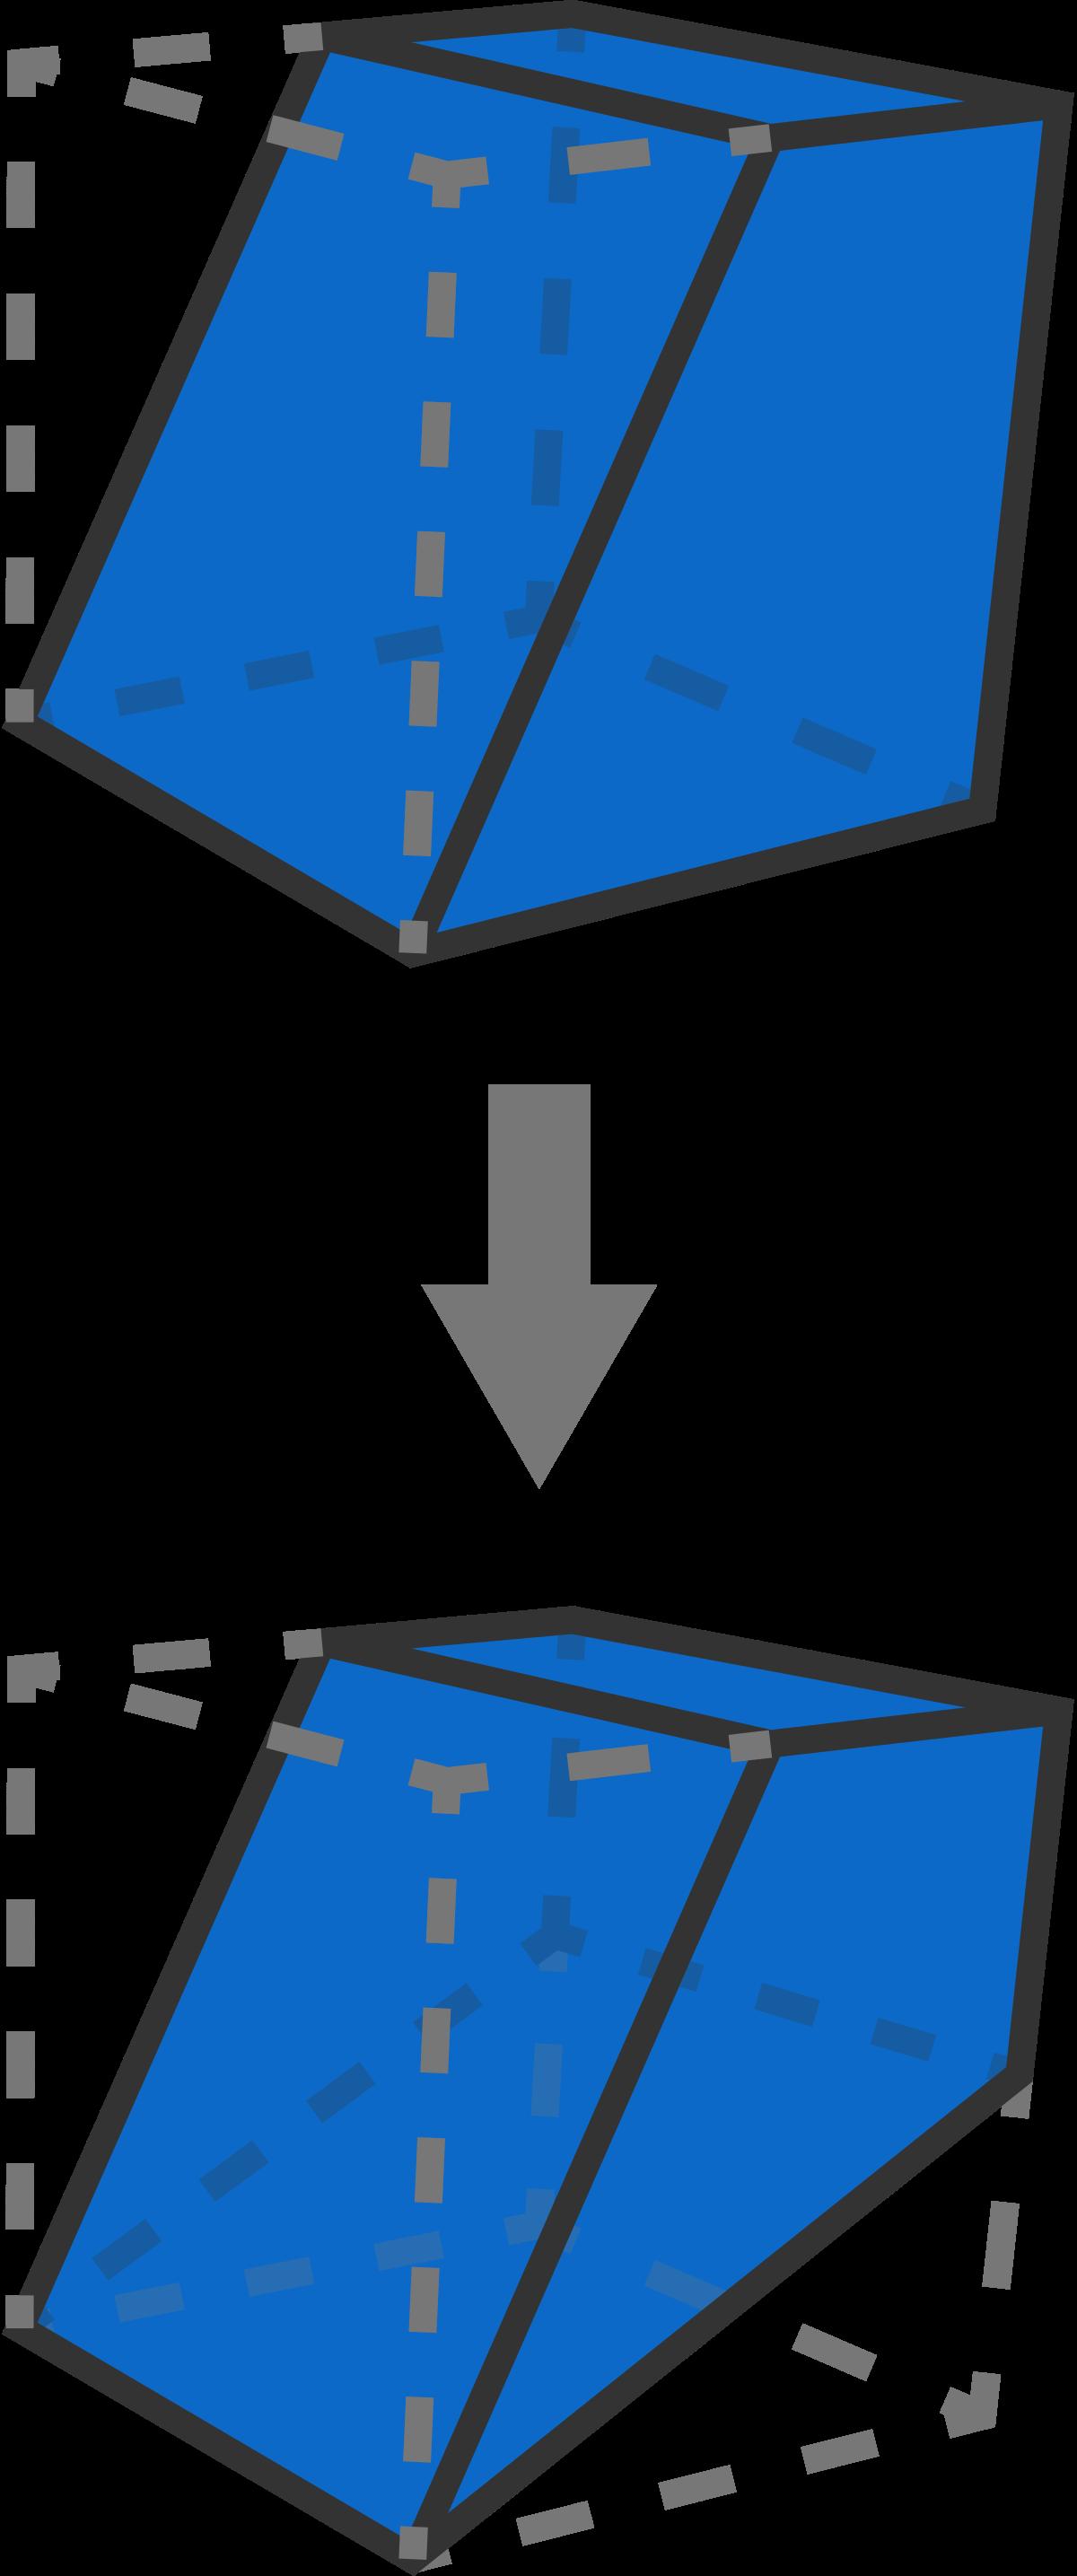 Line clipart line segment. Geometry problem chopping up